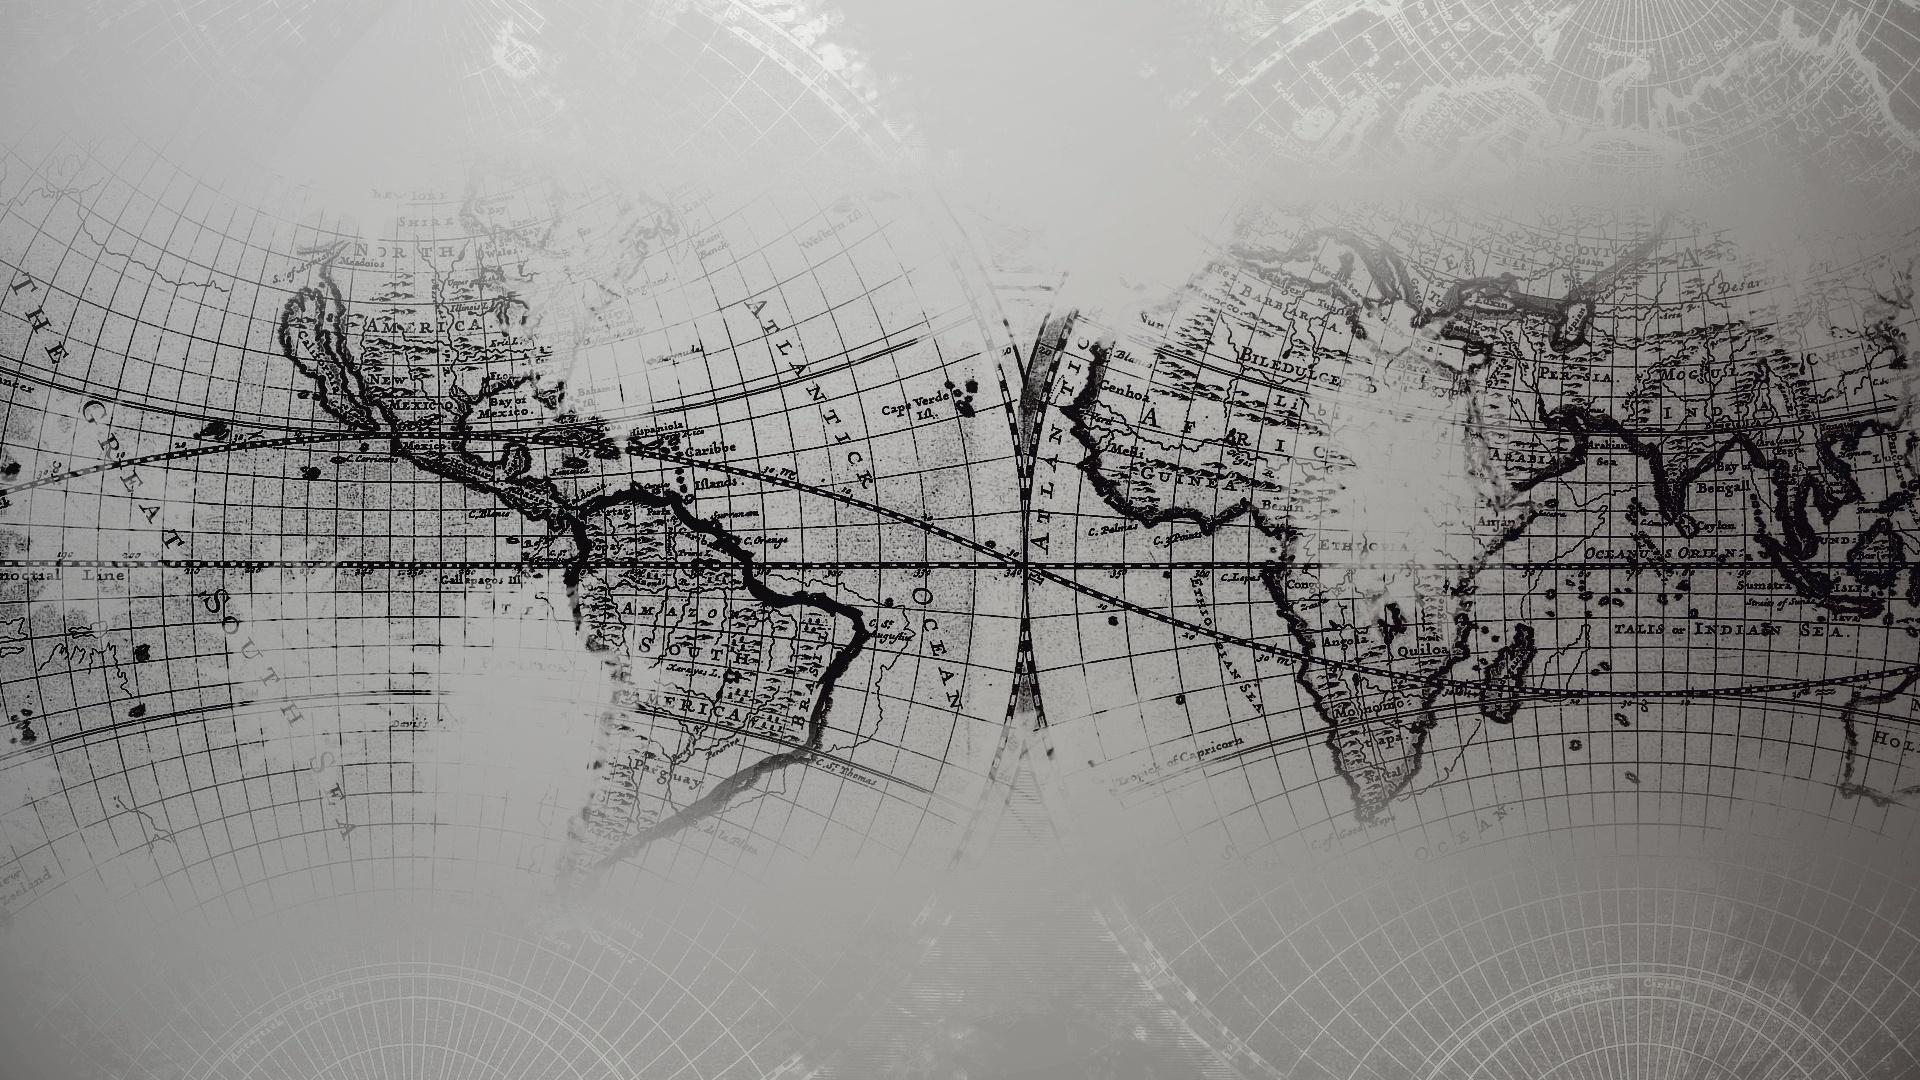 Matrix code world map k hd desktop wallpaper for k ultra hd gumiabroncs Image collections